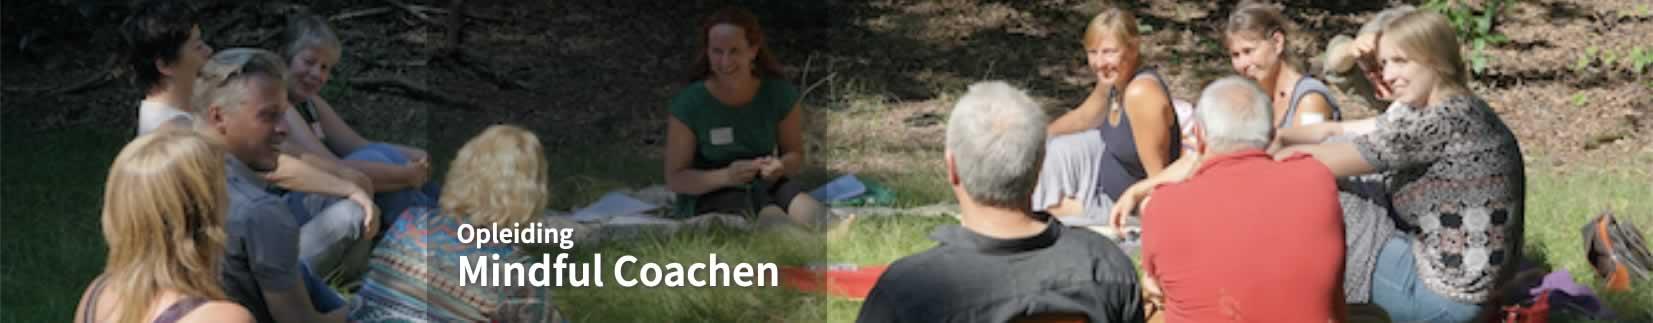 Openbewustzijn Opleiding Mindful Coachen